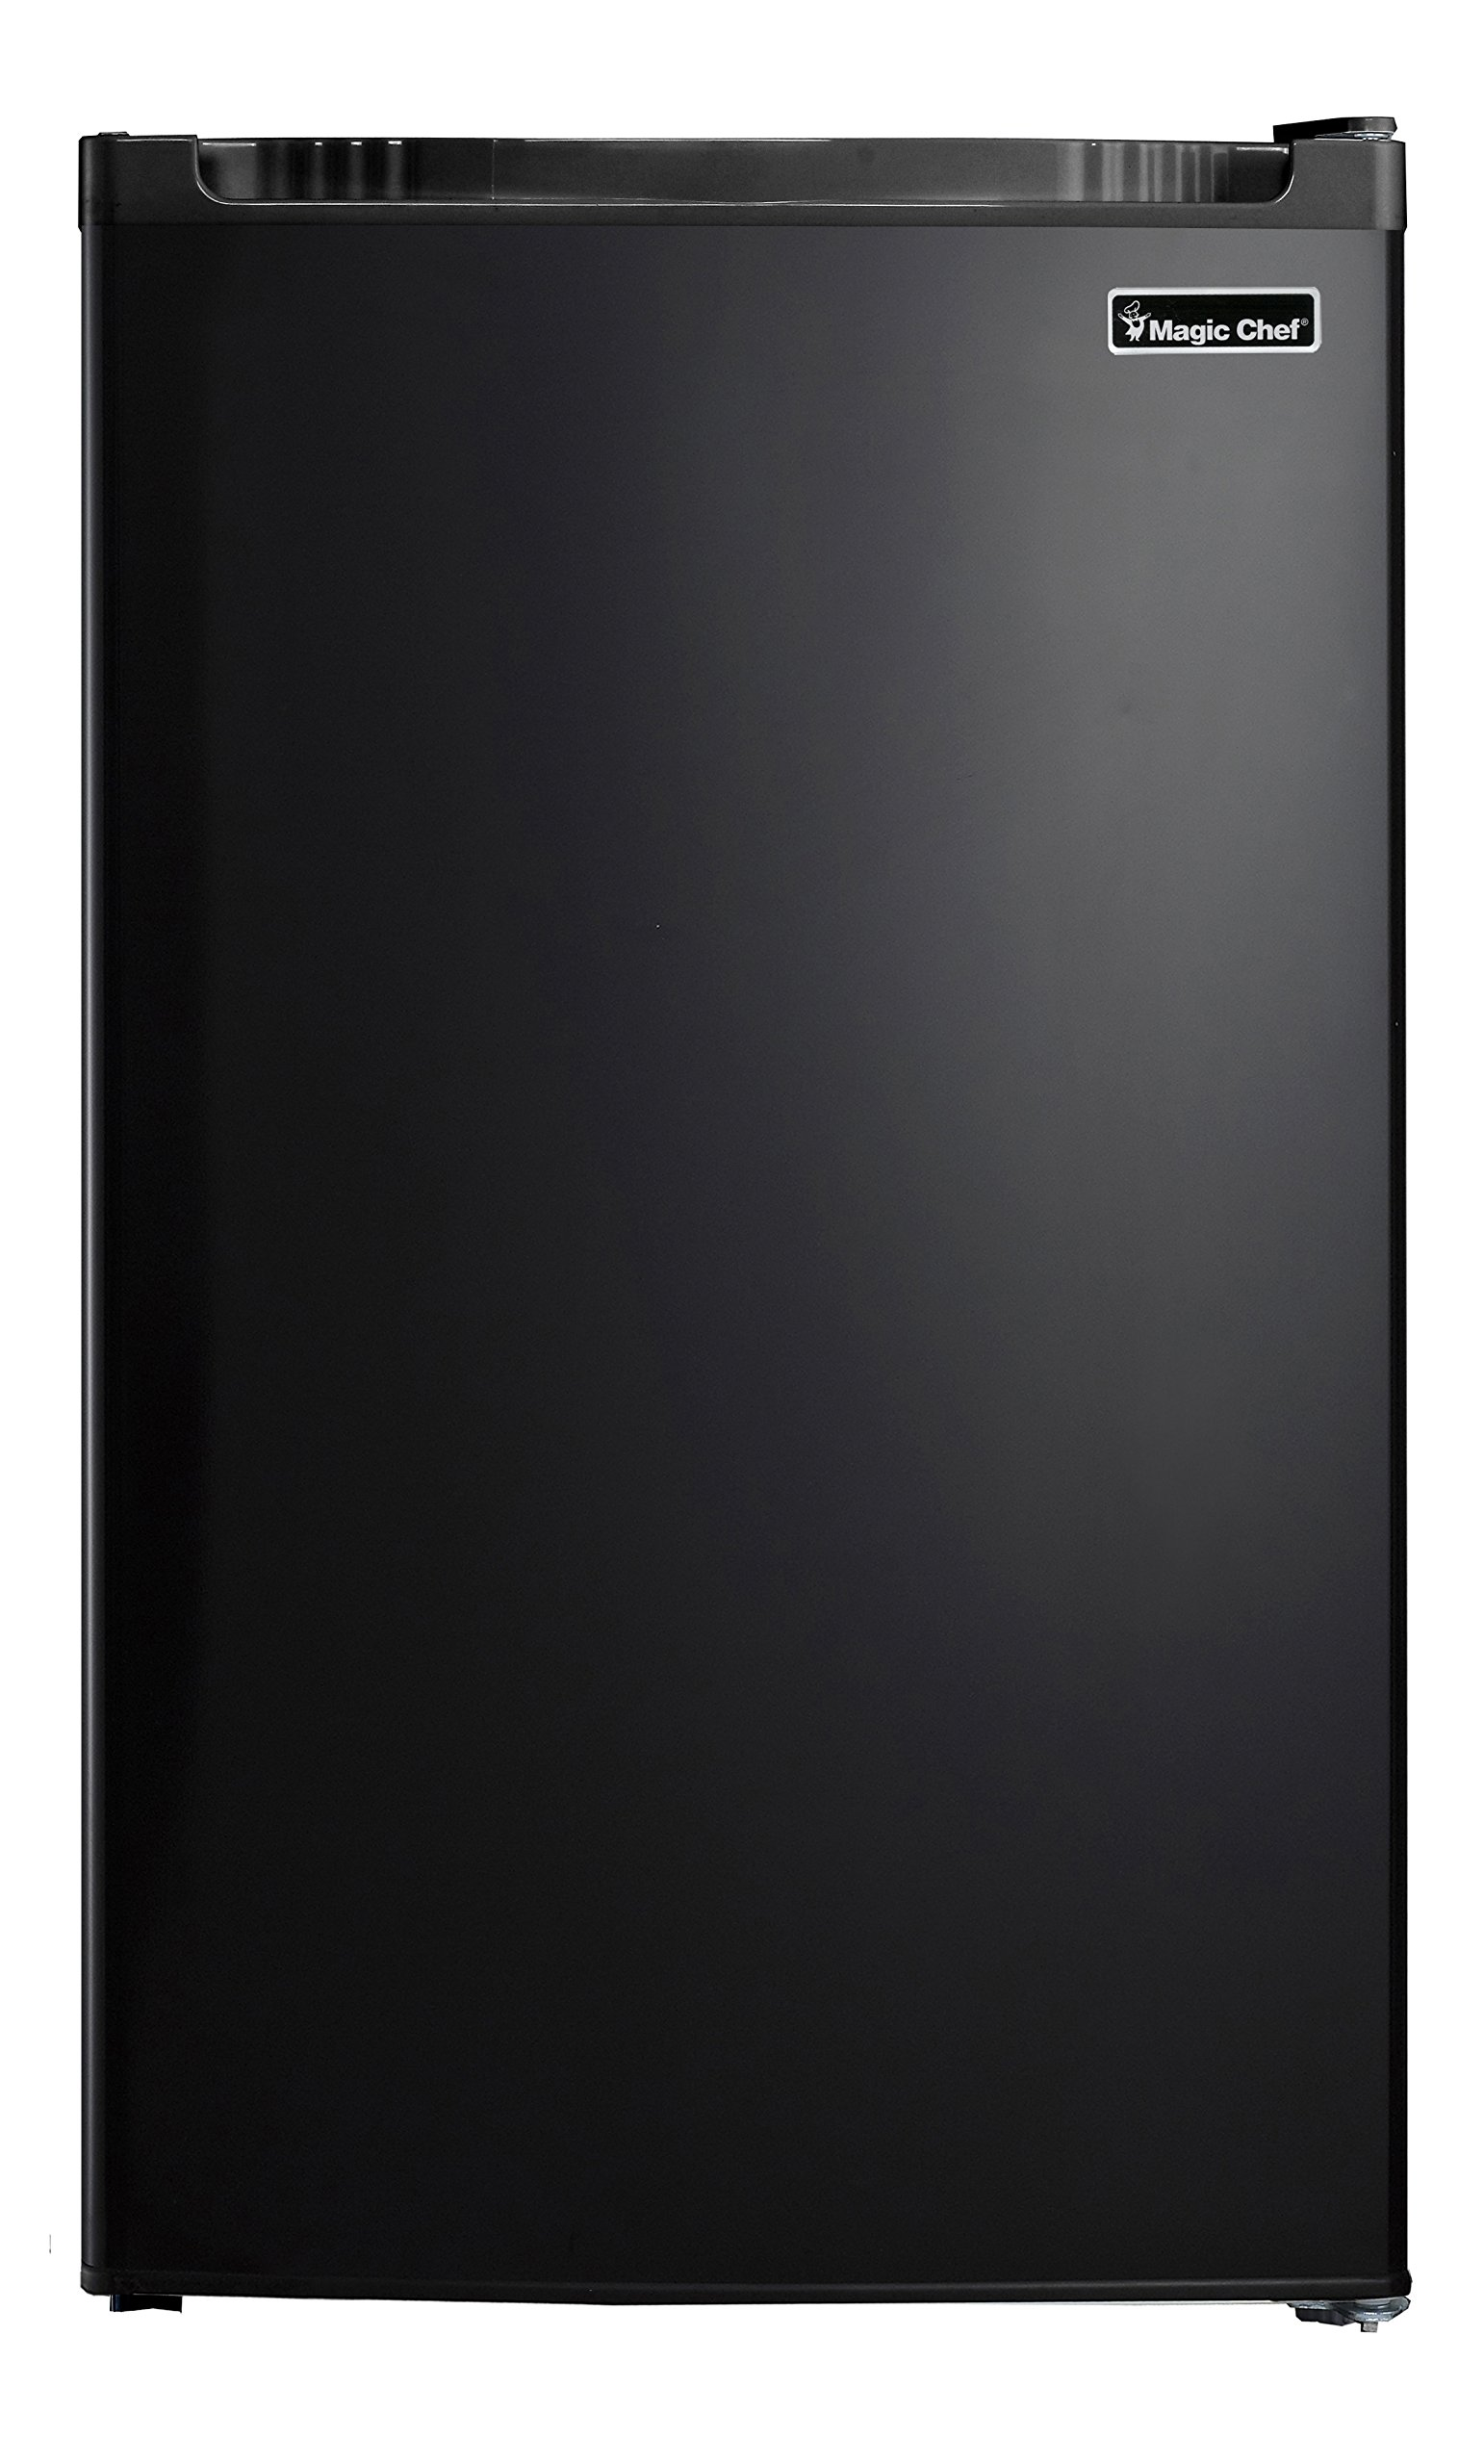 Magic Chef MCBR440B2 Refrigerator, 4.4 cu. ft., Black